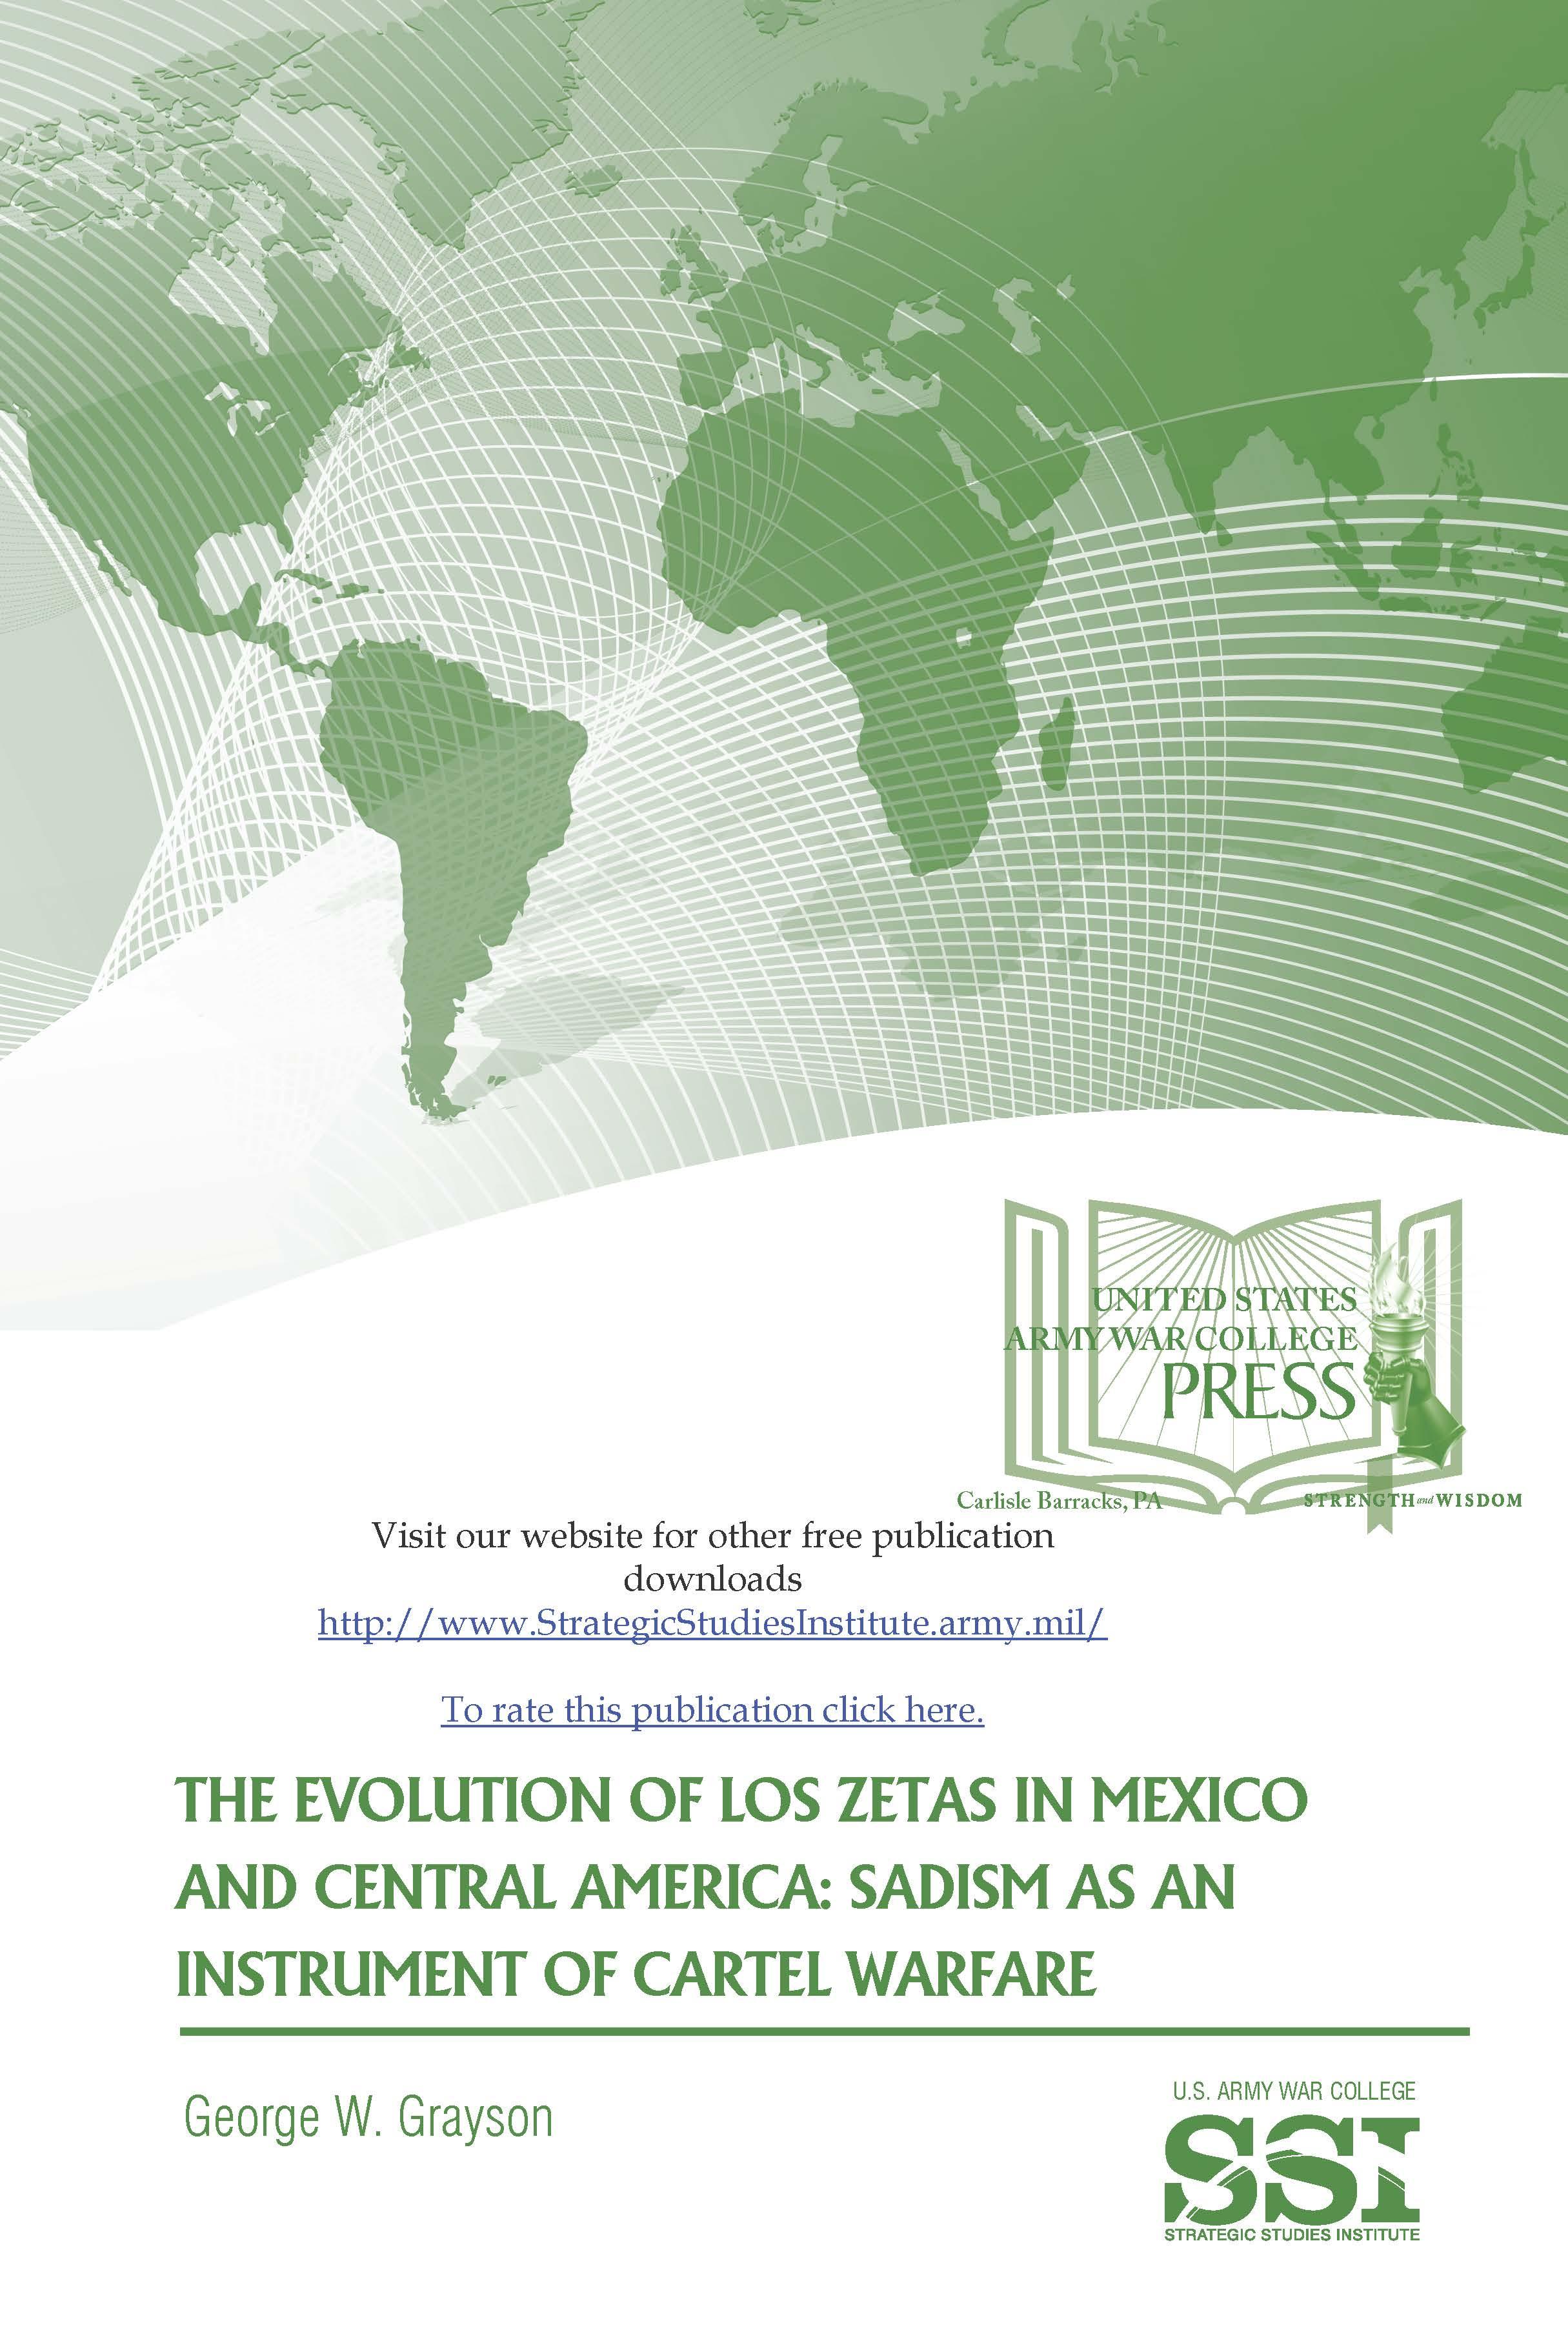 Los Zetas: Mexico's Most Feared Drug Cartel | Government